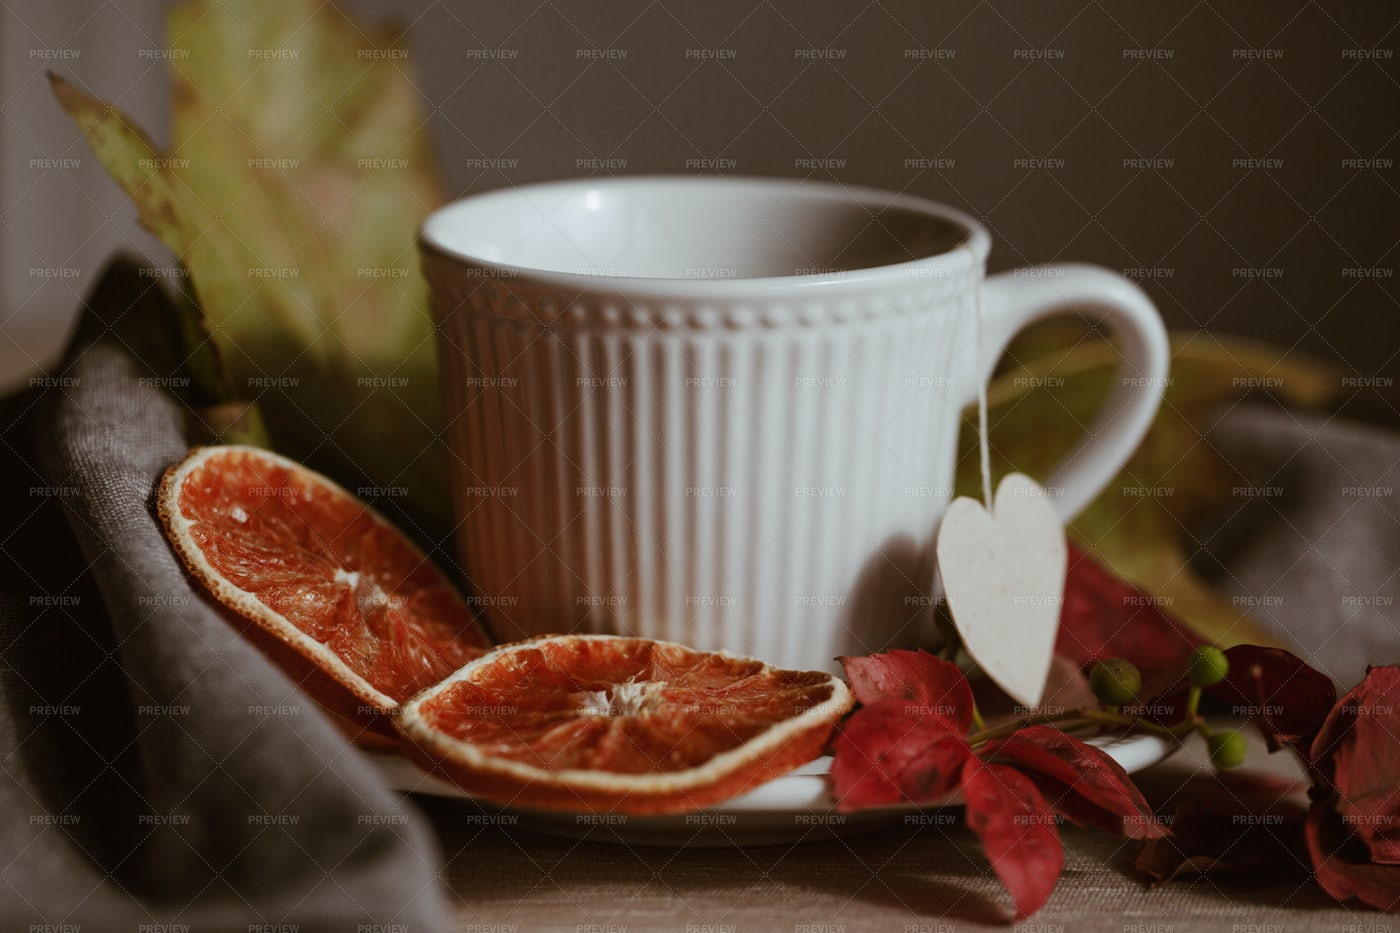 Orange Slices With Tea: Stock Photos